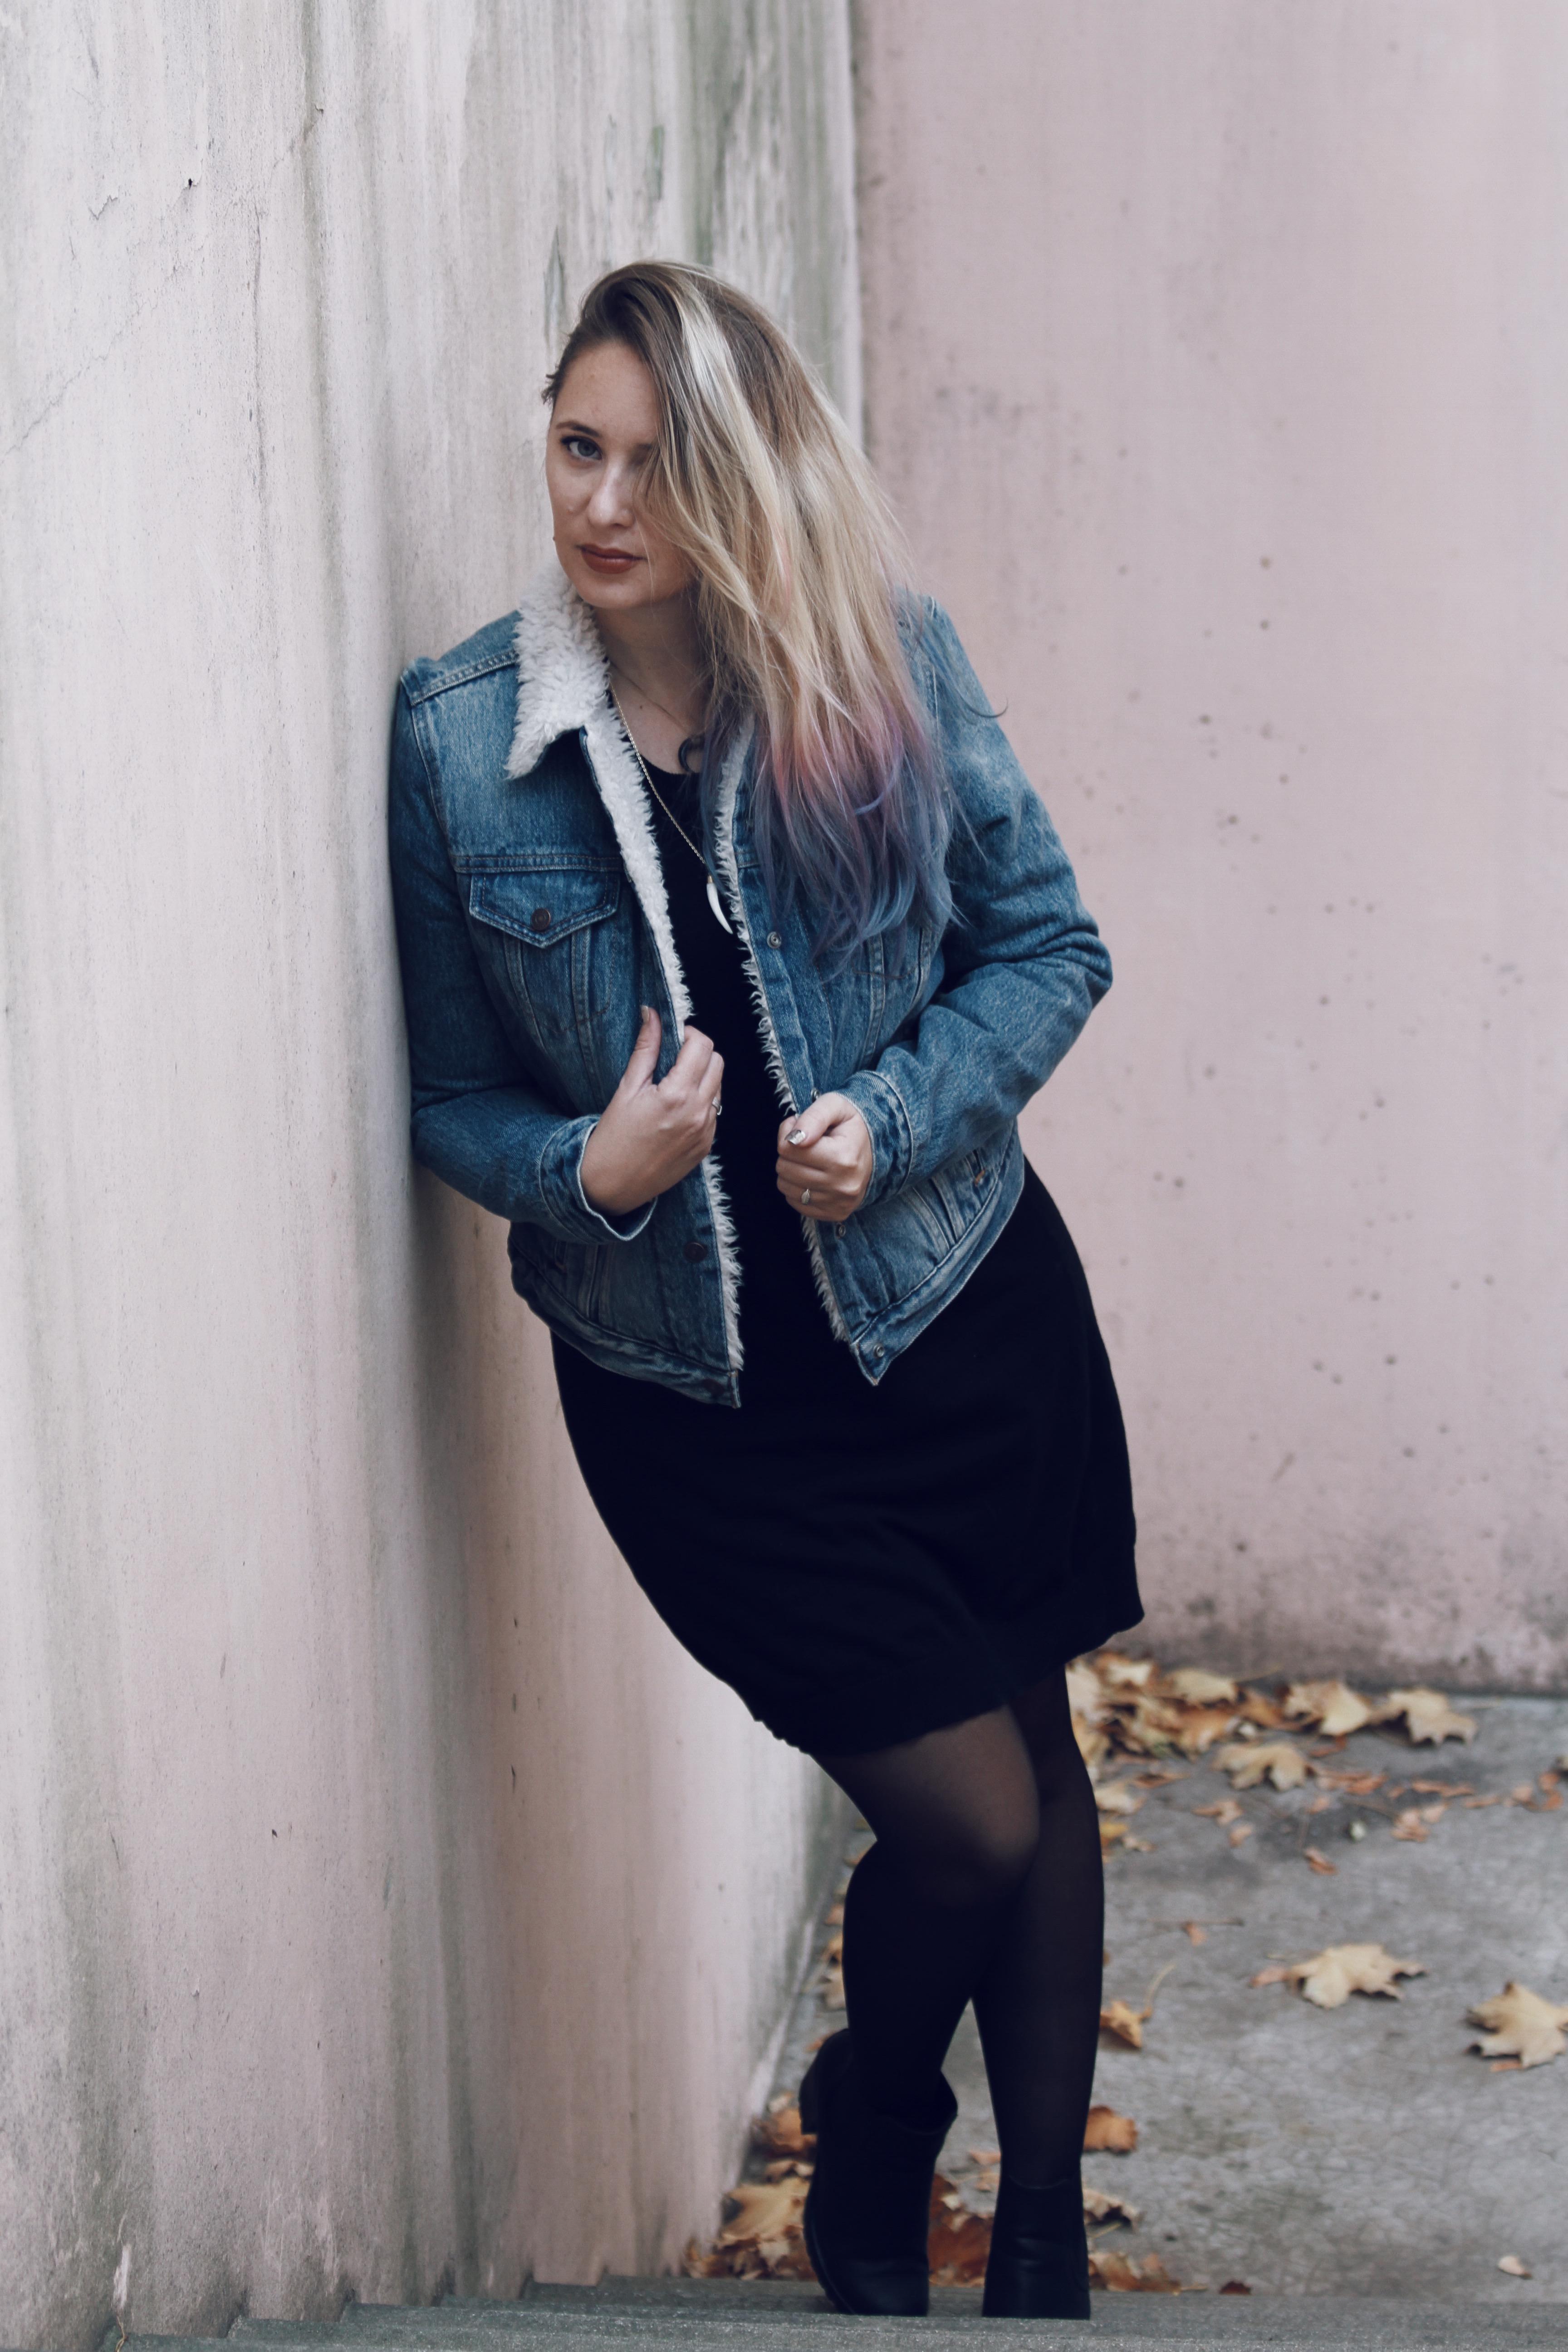 levis-denim-veste-sherpa-jeans-look